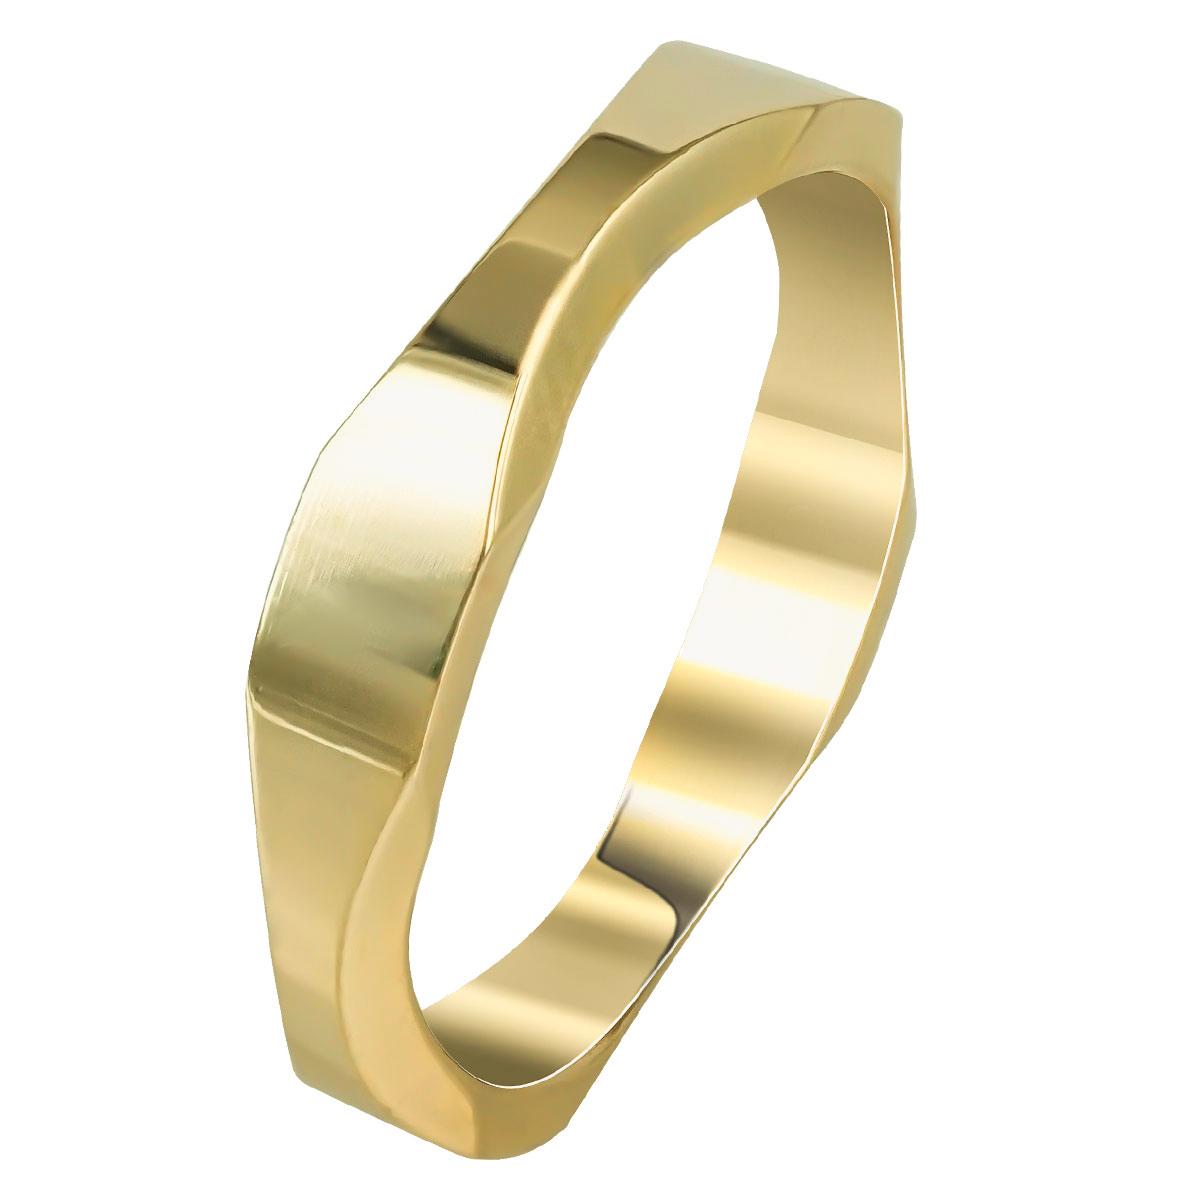 Kίτρινη Χρυσή Βέρα Γάμου WR254 k14